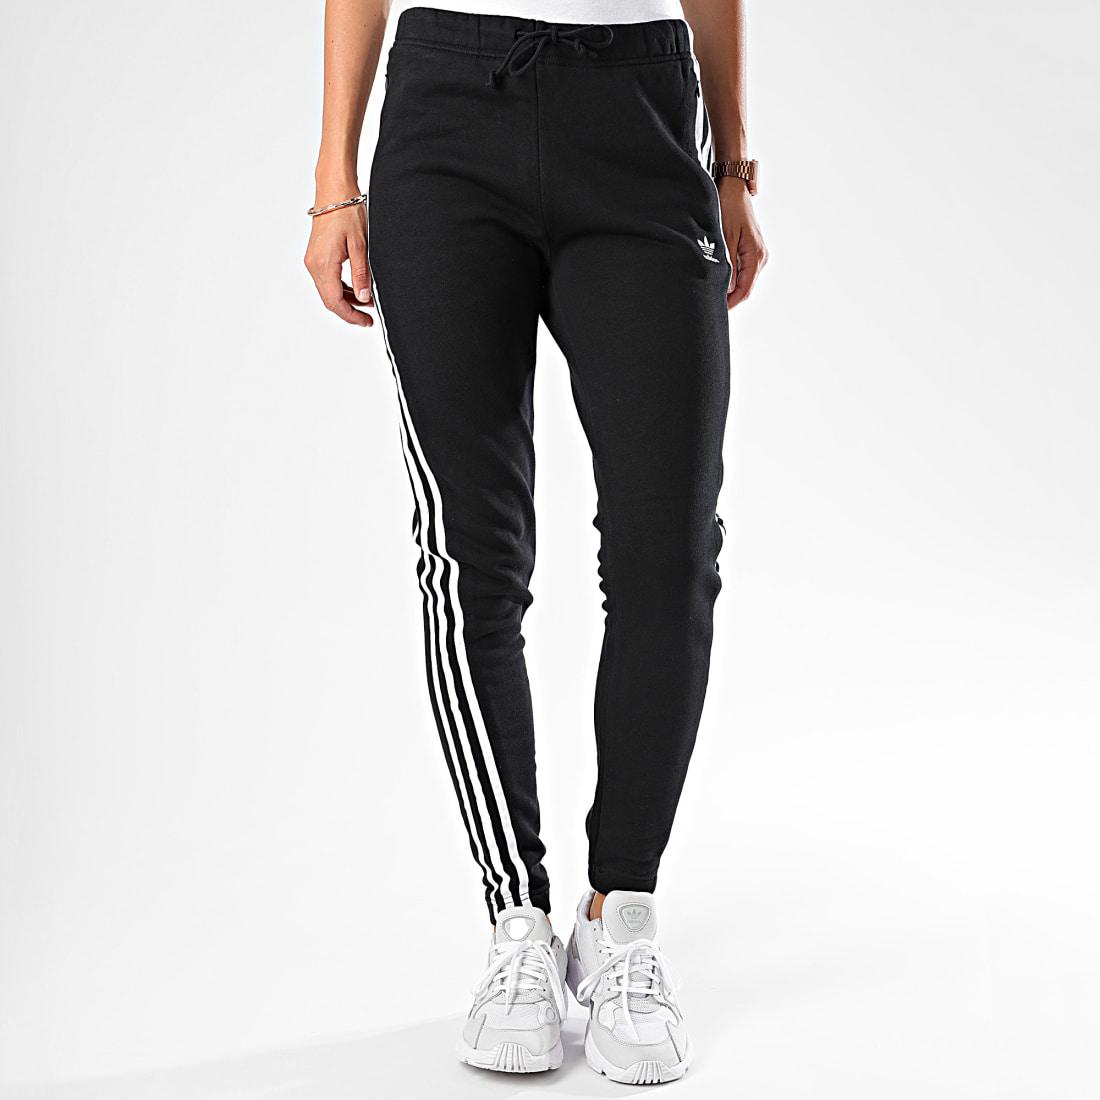 pantalon jogging femme adidas